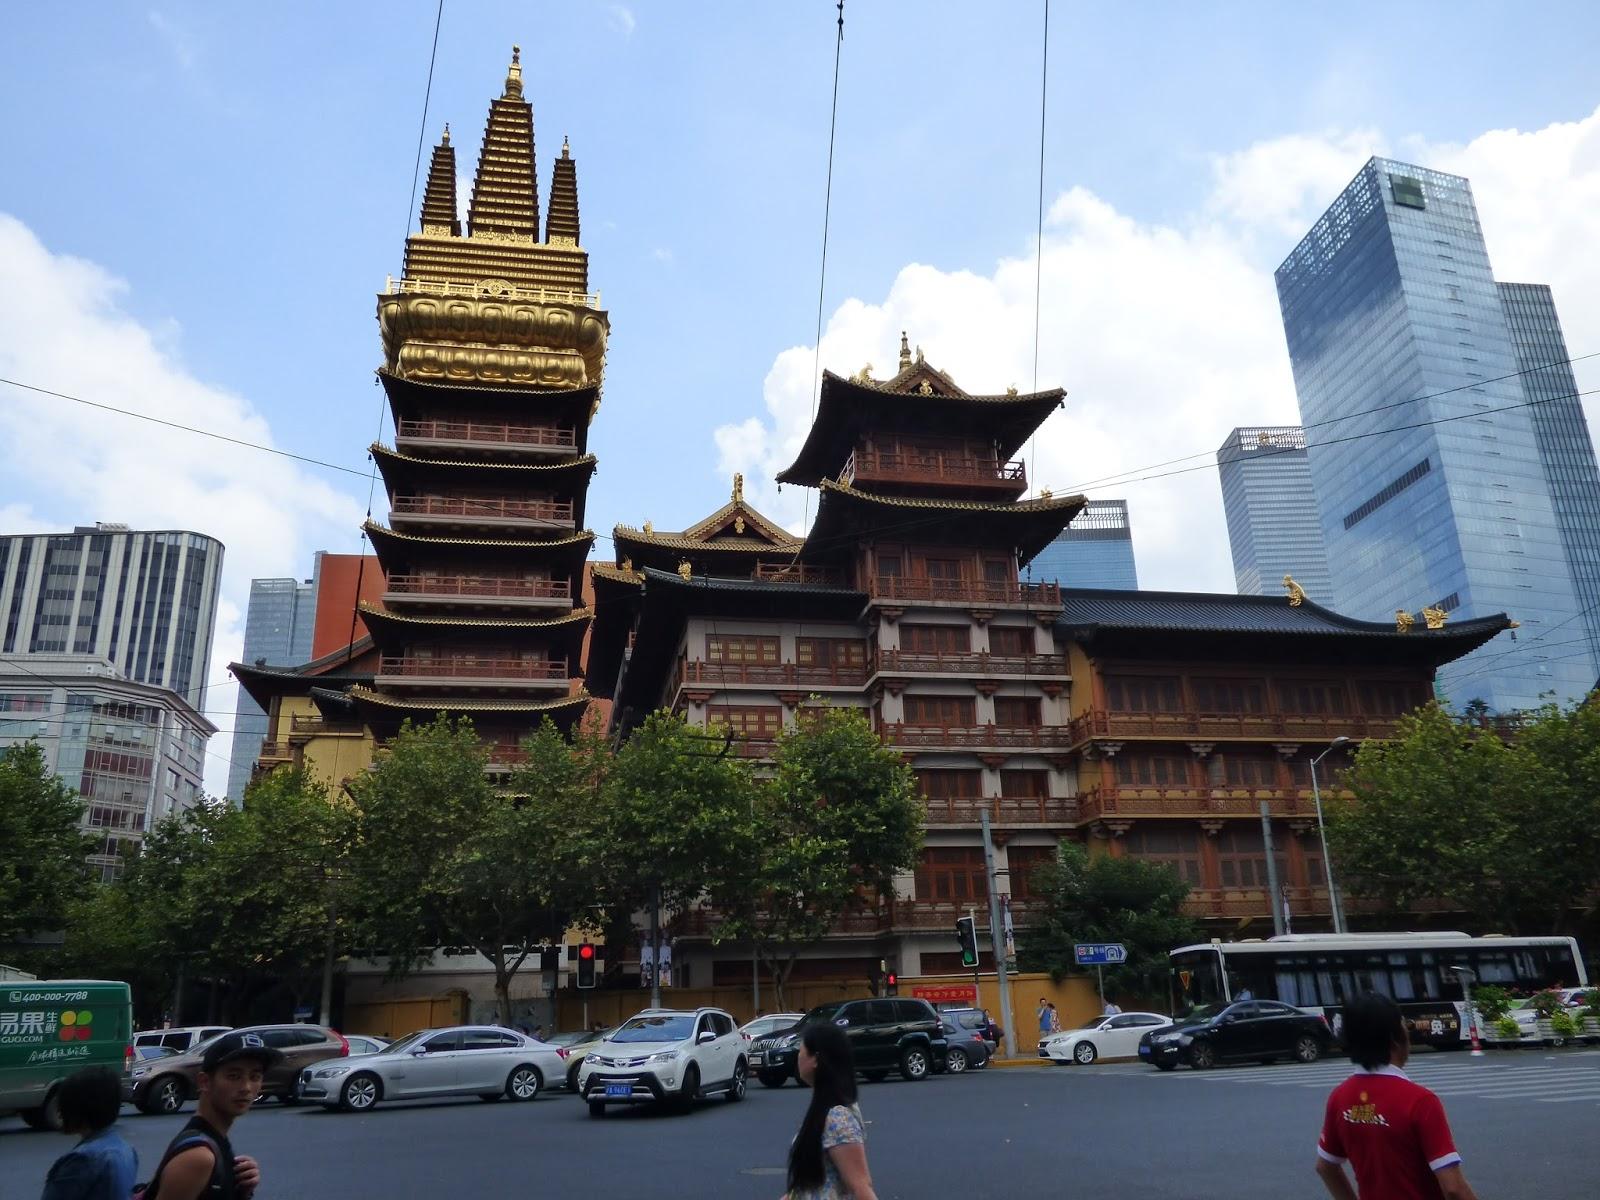 Jing'an templom